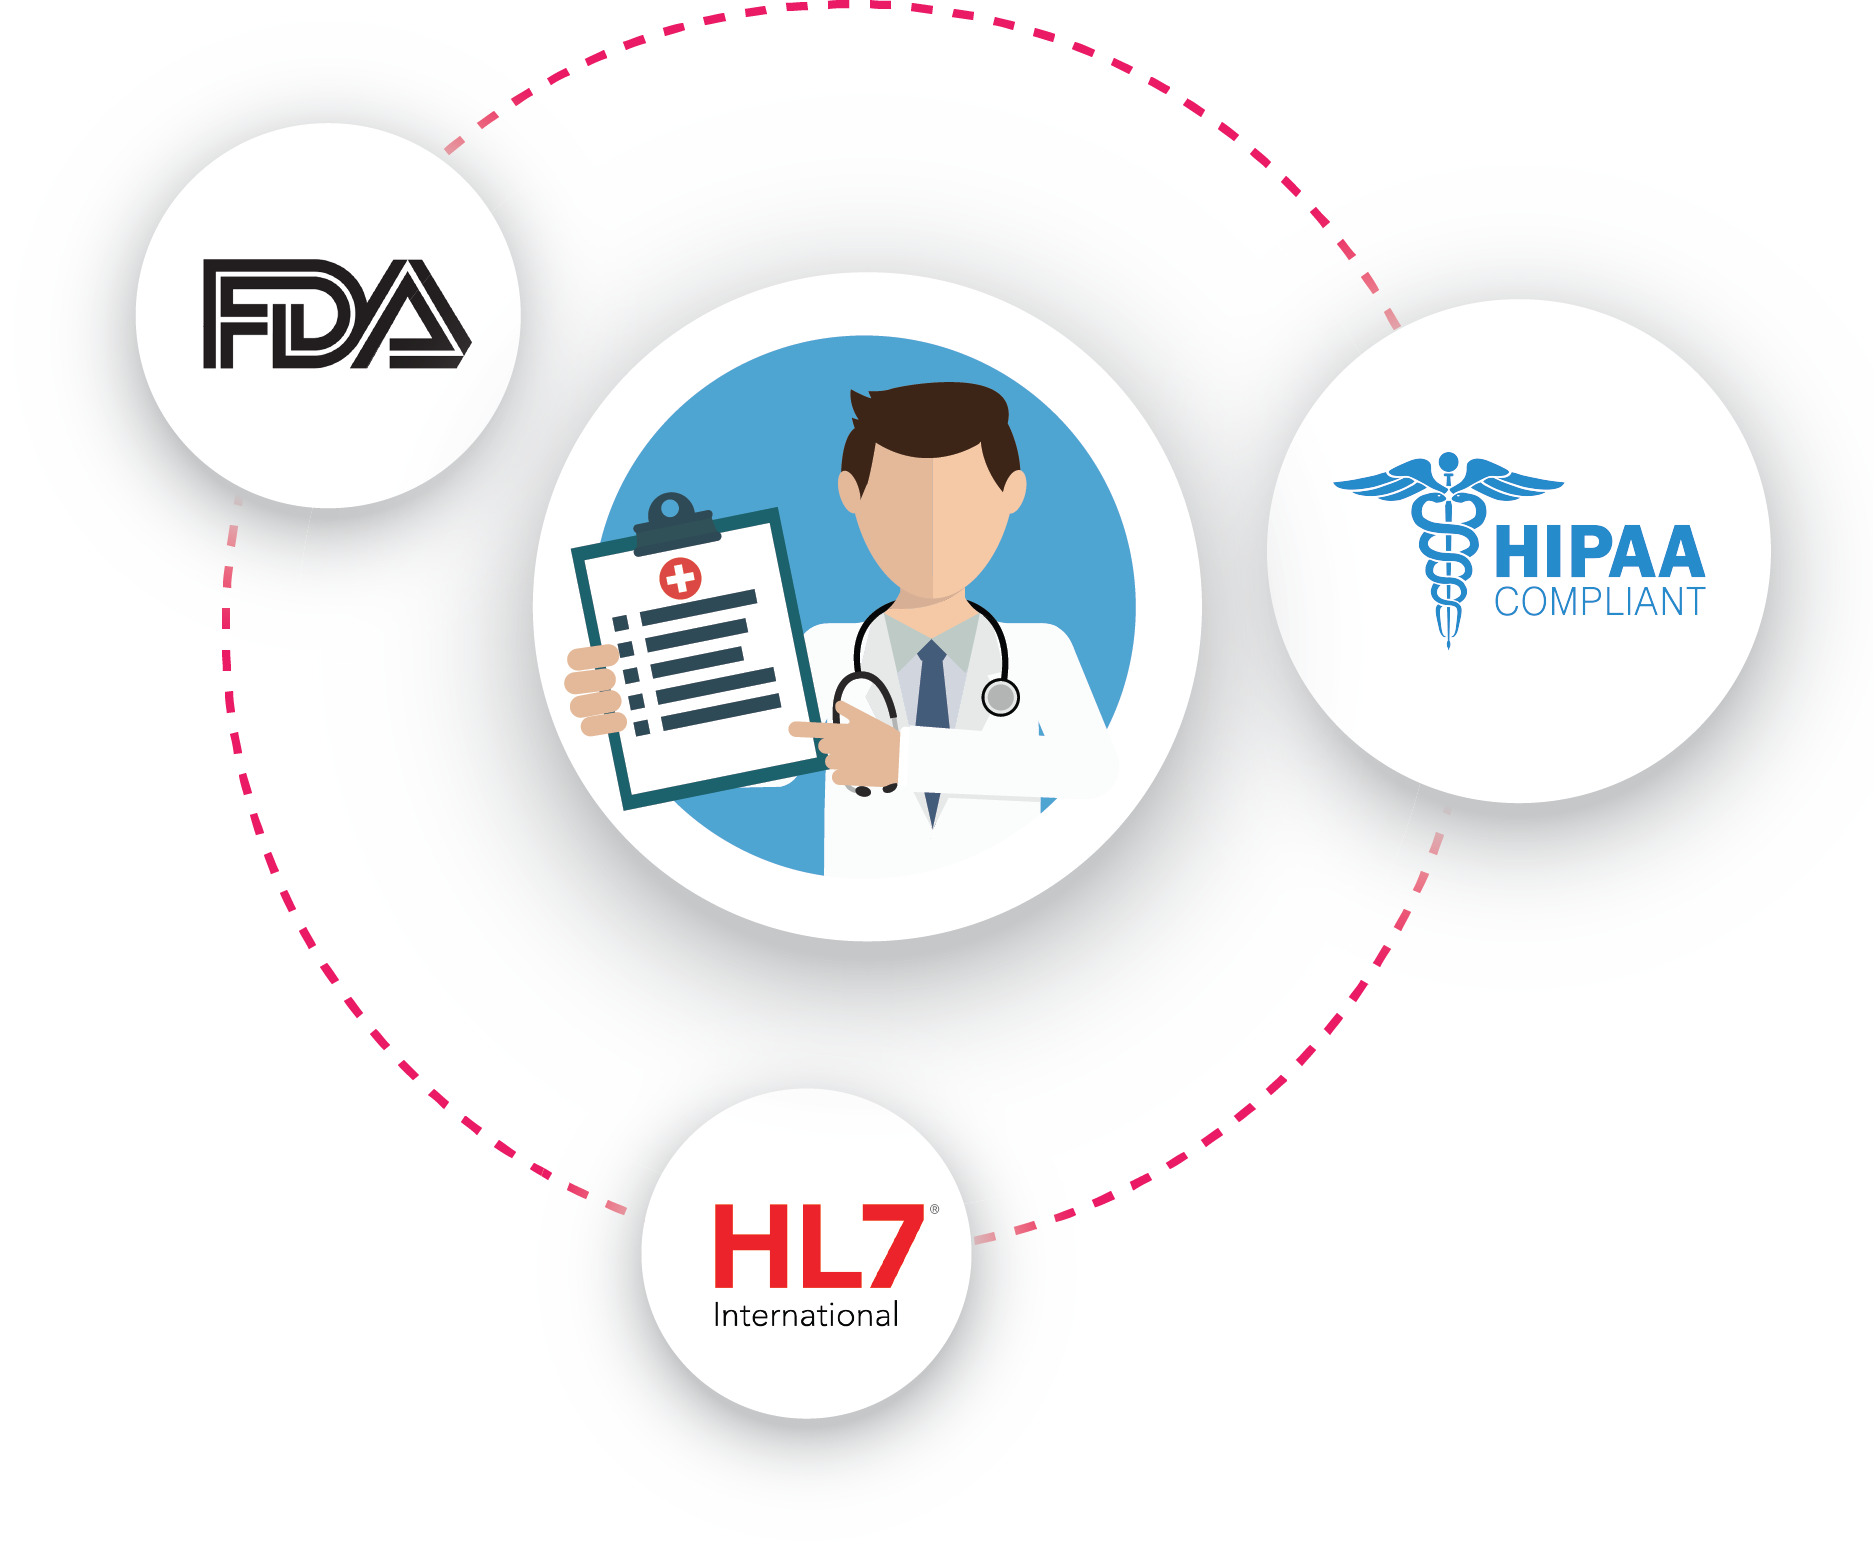 Healthcare Application Development Company